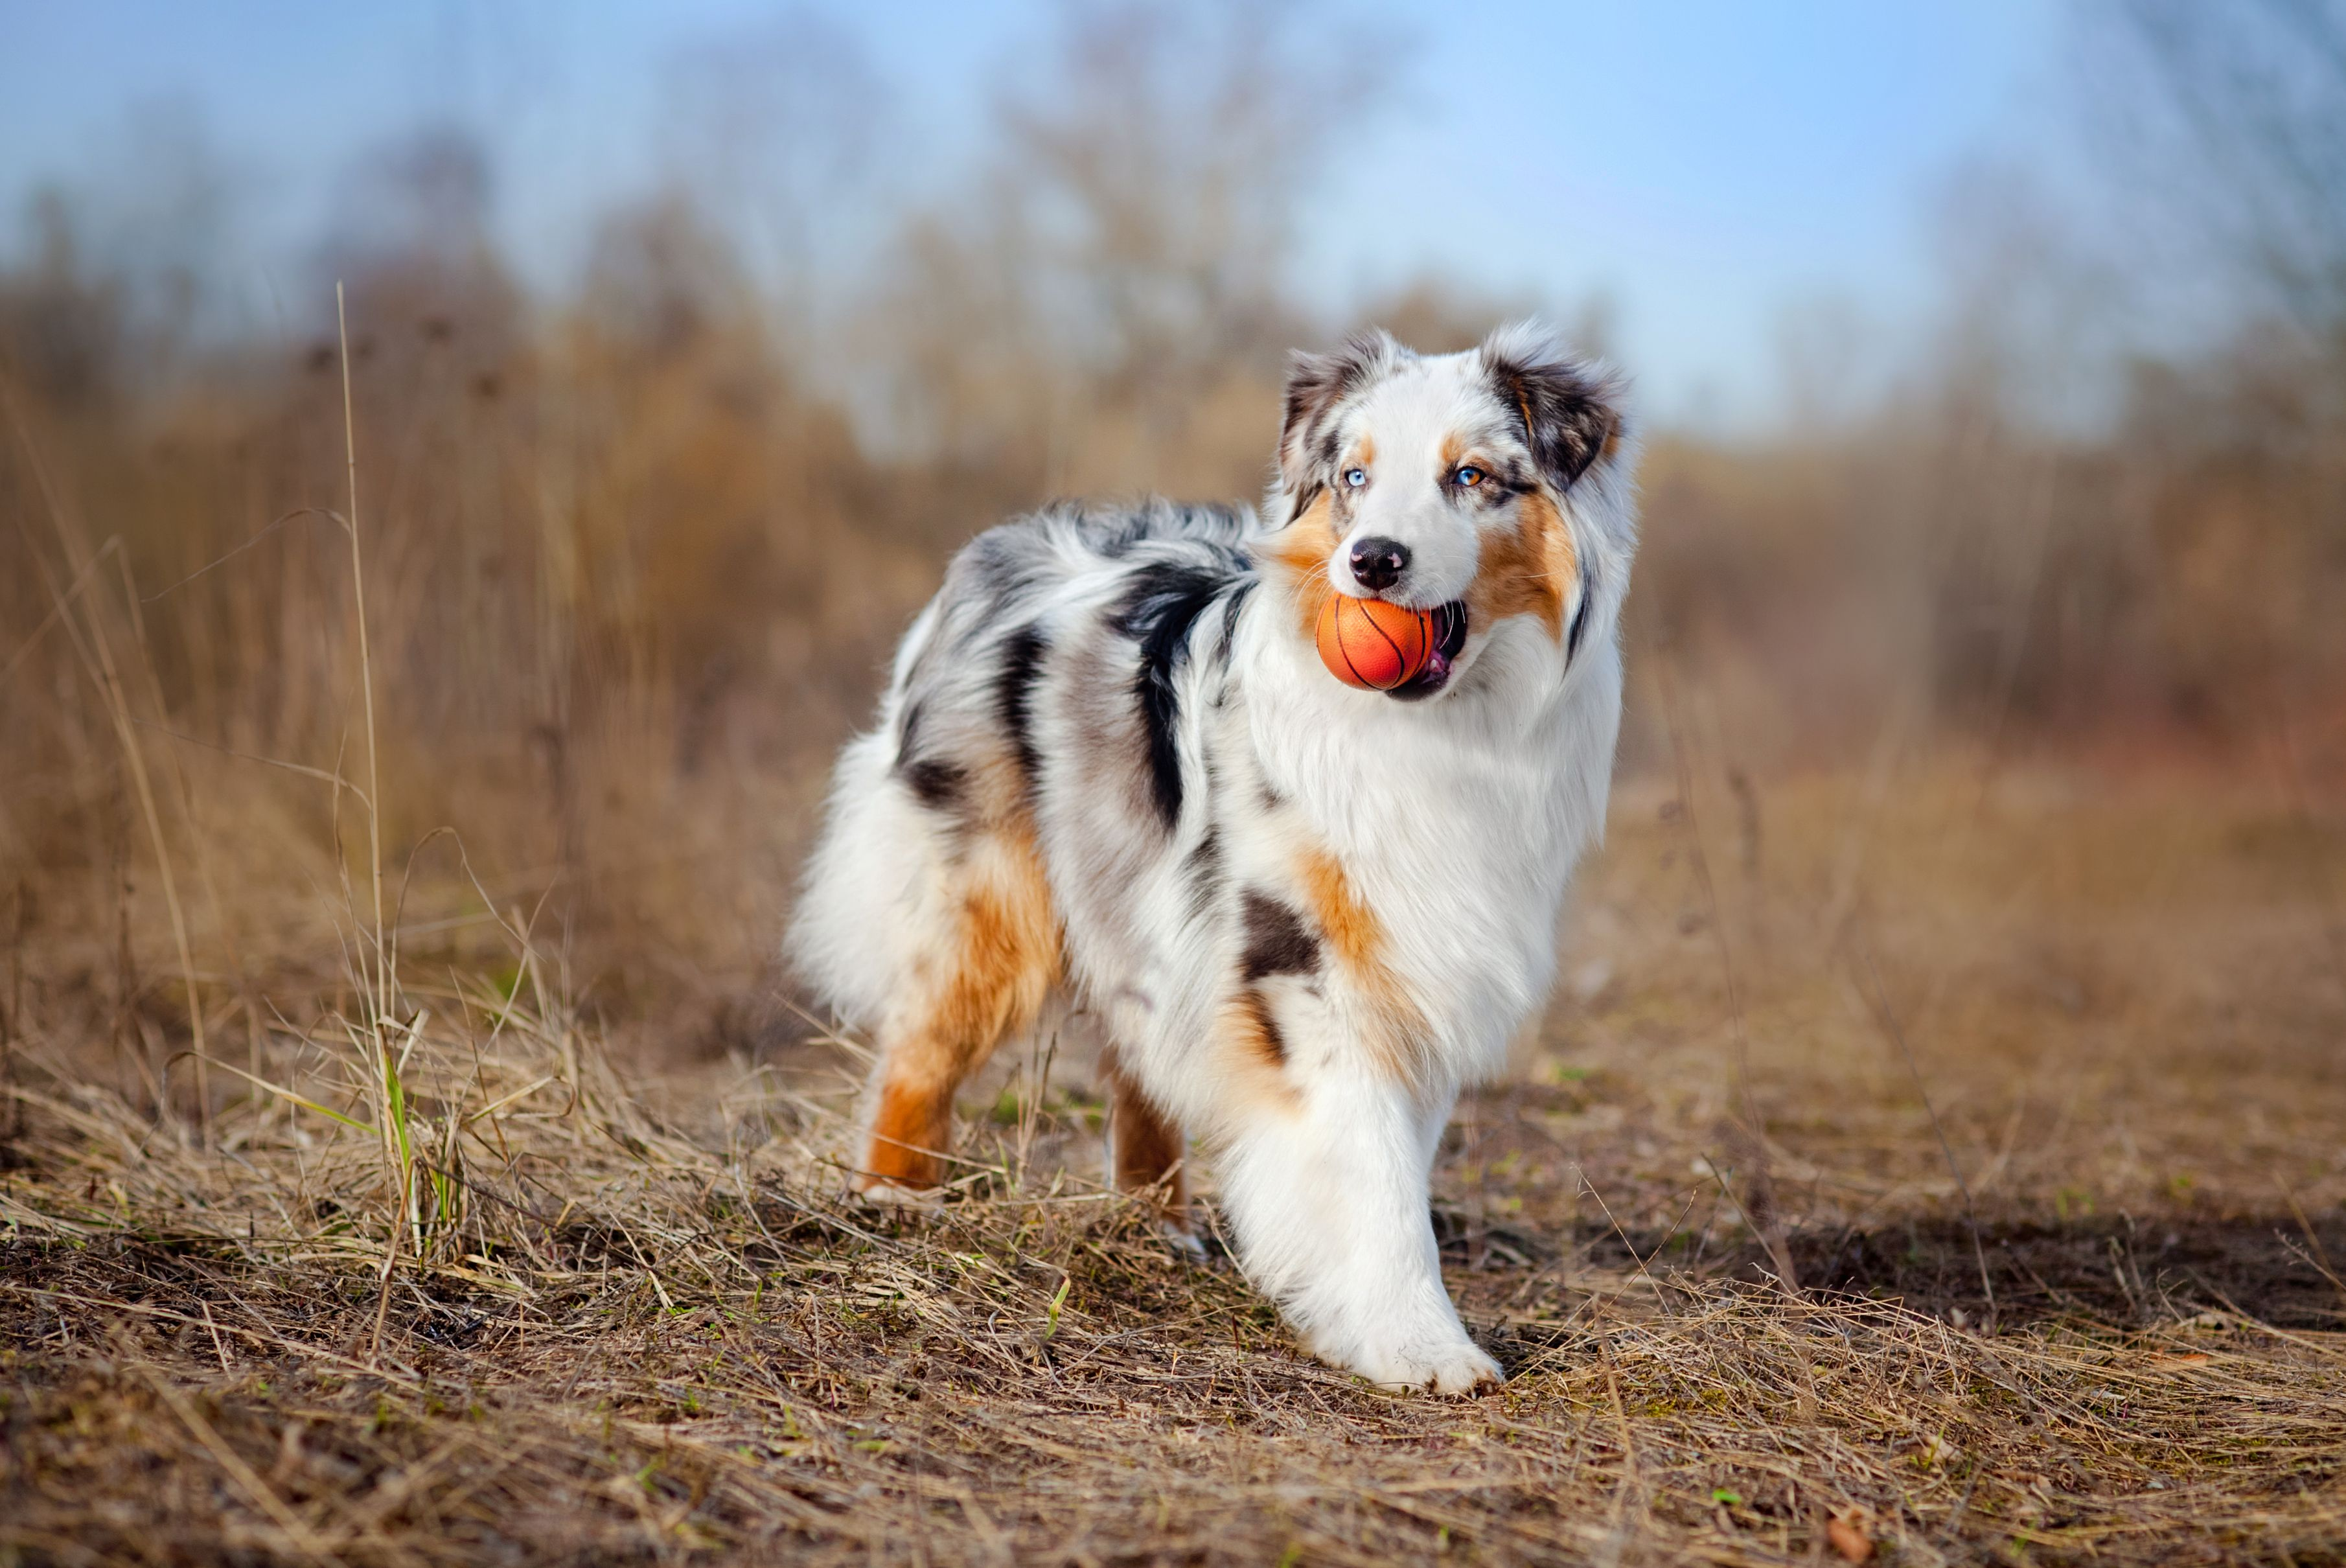 40 Best Medium Sized Dog Breeds List Of Popular Cute Medium Sized Dogs For Families